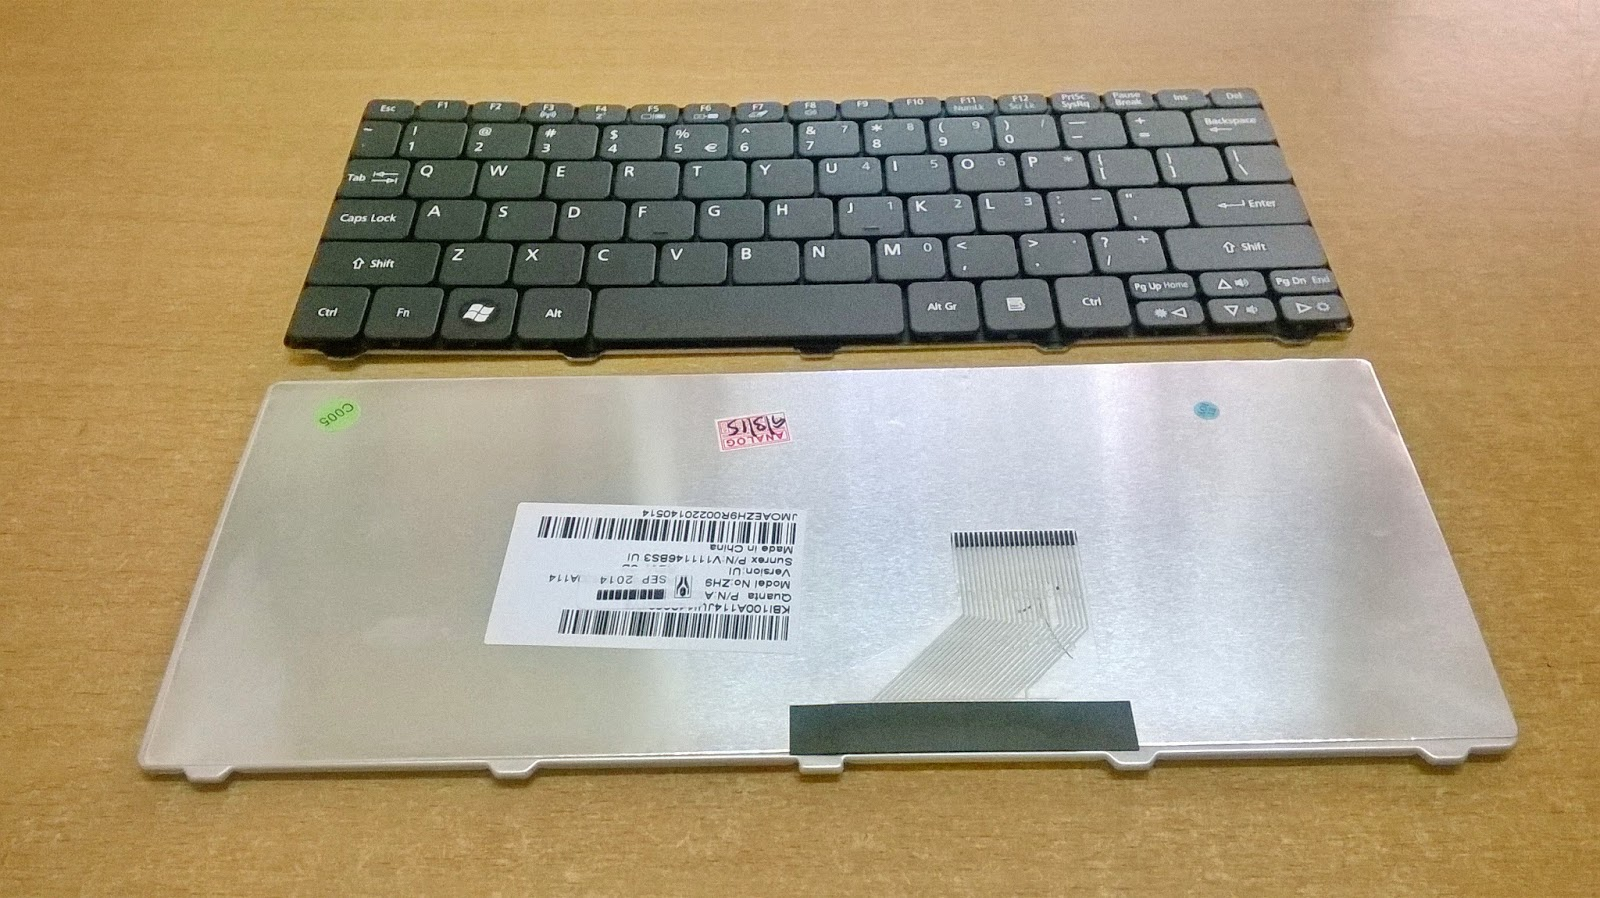 Laptop Keyboard Replacement Calicut Malappuram Kannur New Acer Dell Inspiron 1440 Series Aspire Mini 532 D275 From Laptoplabnet